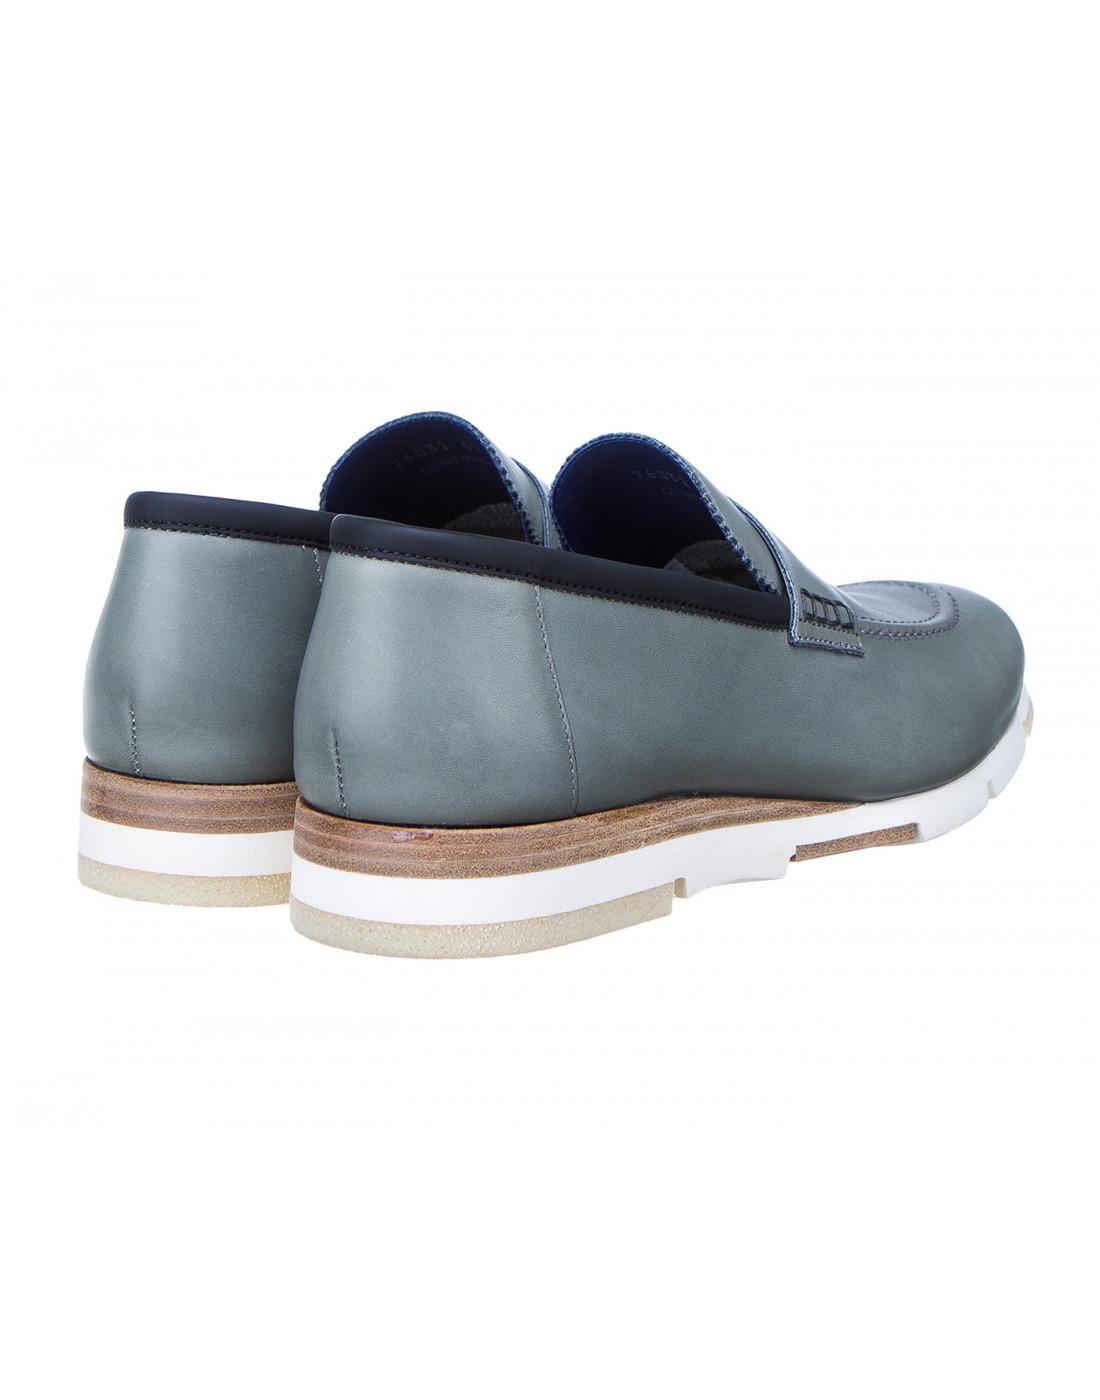 Туфли серые мужские A.Guardiani S76032S-3